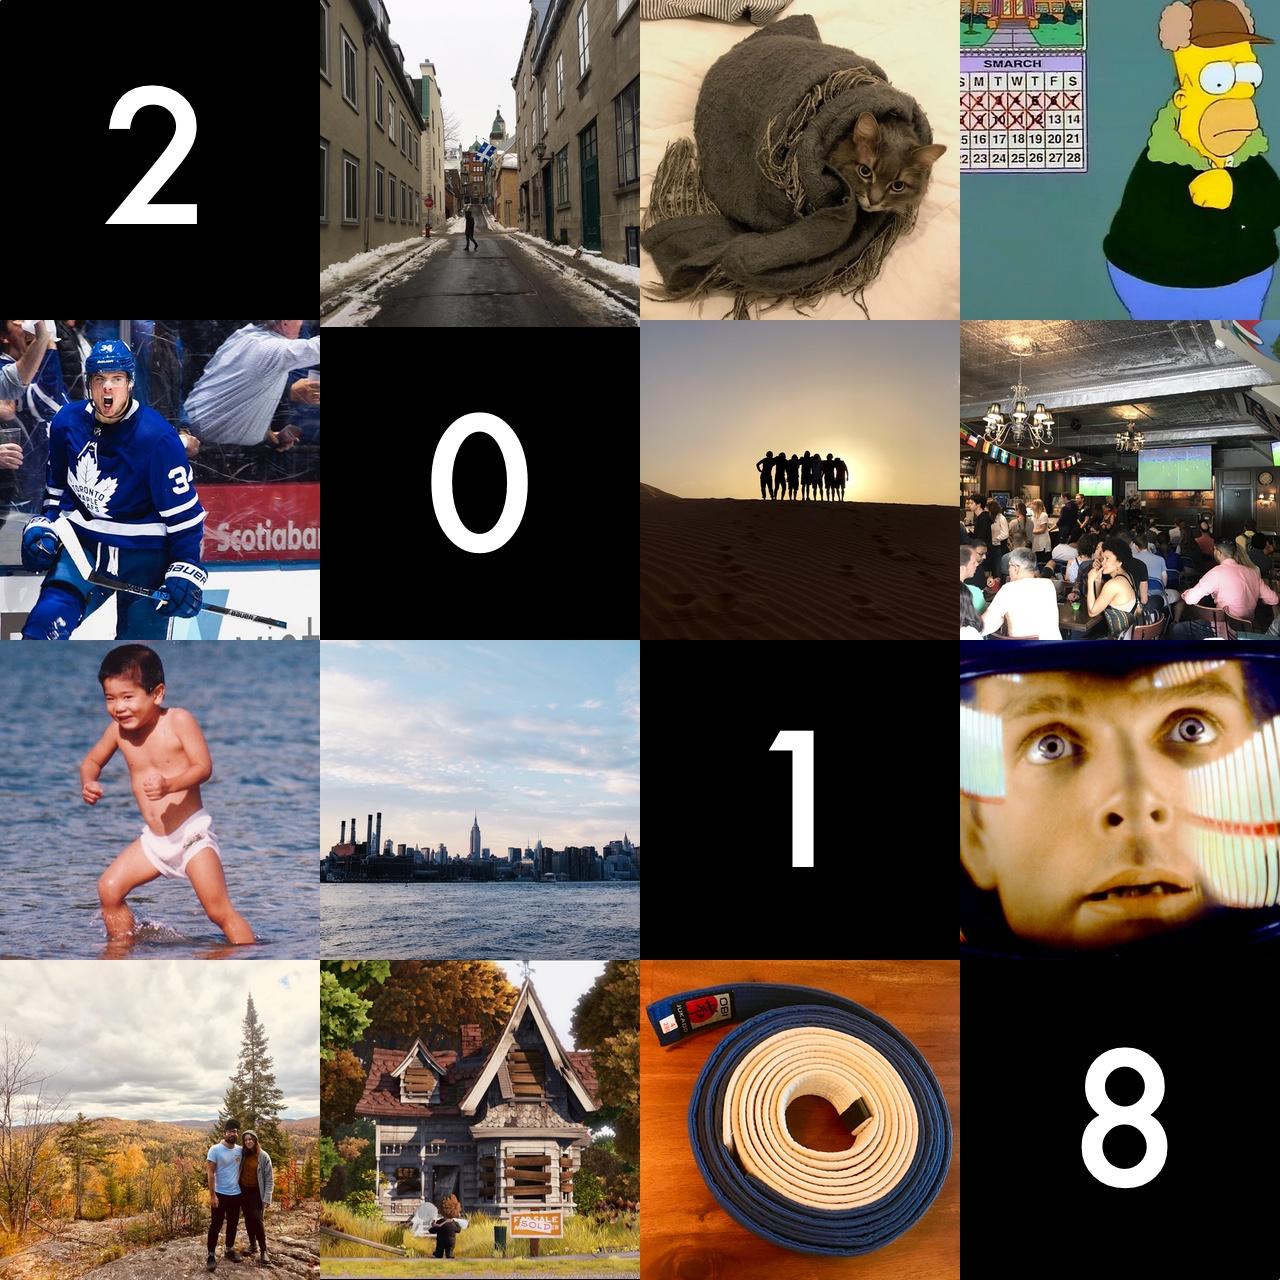 Tetchi's 2018 year in summary